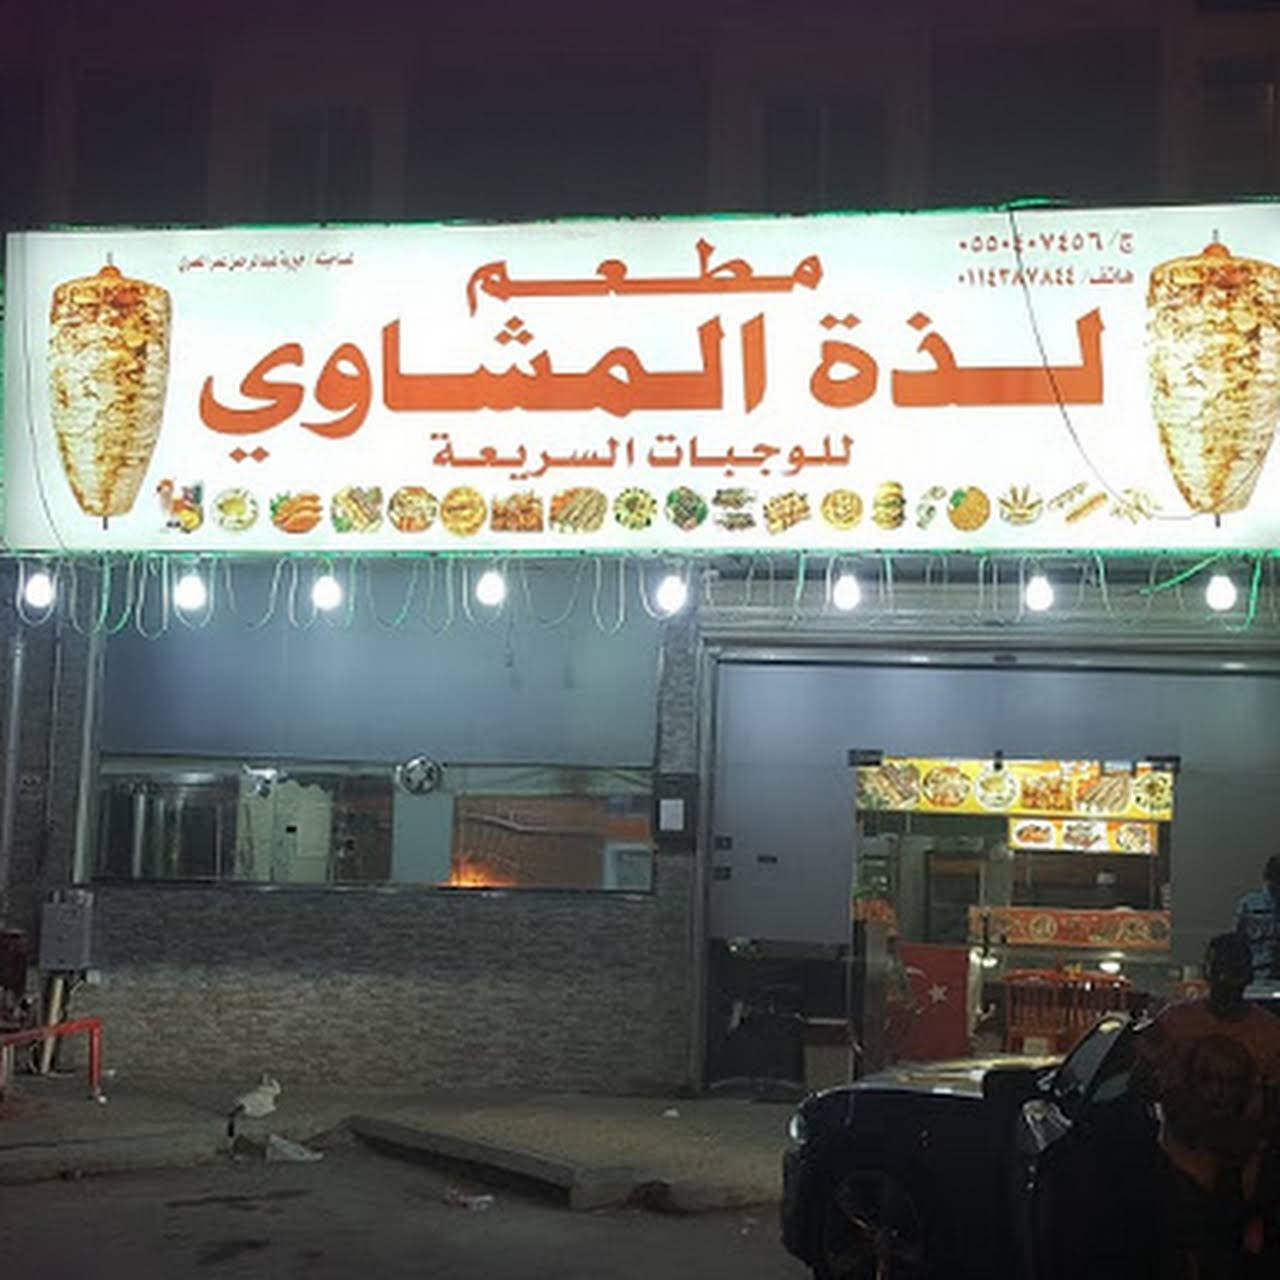 أسعار منيو ورقم وعنوان فروع مطعم لذة المشاوي lazza mashwy